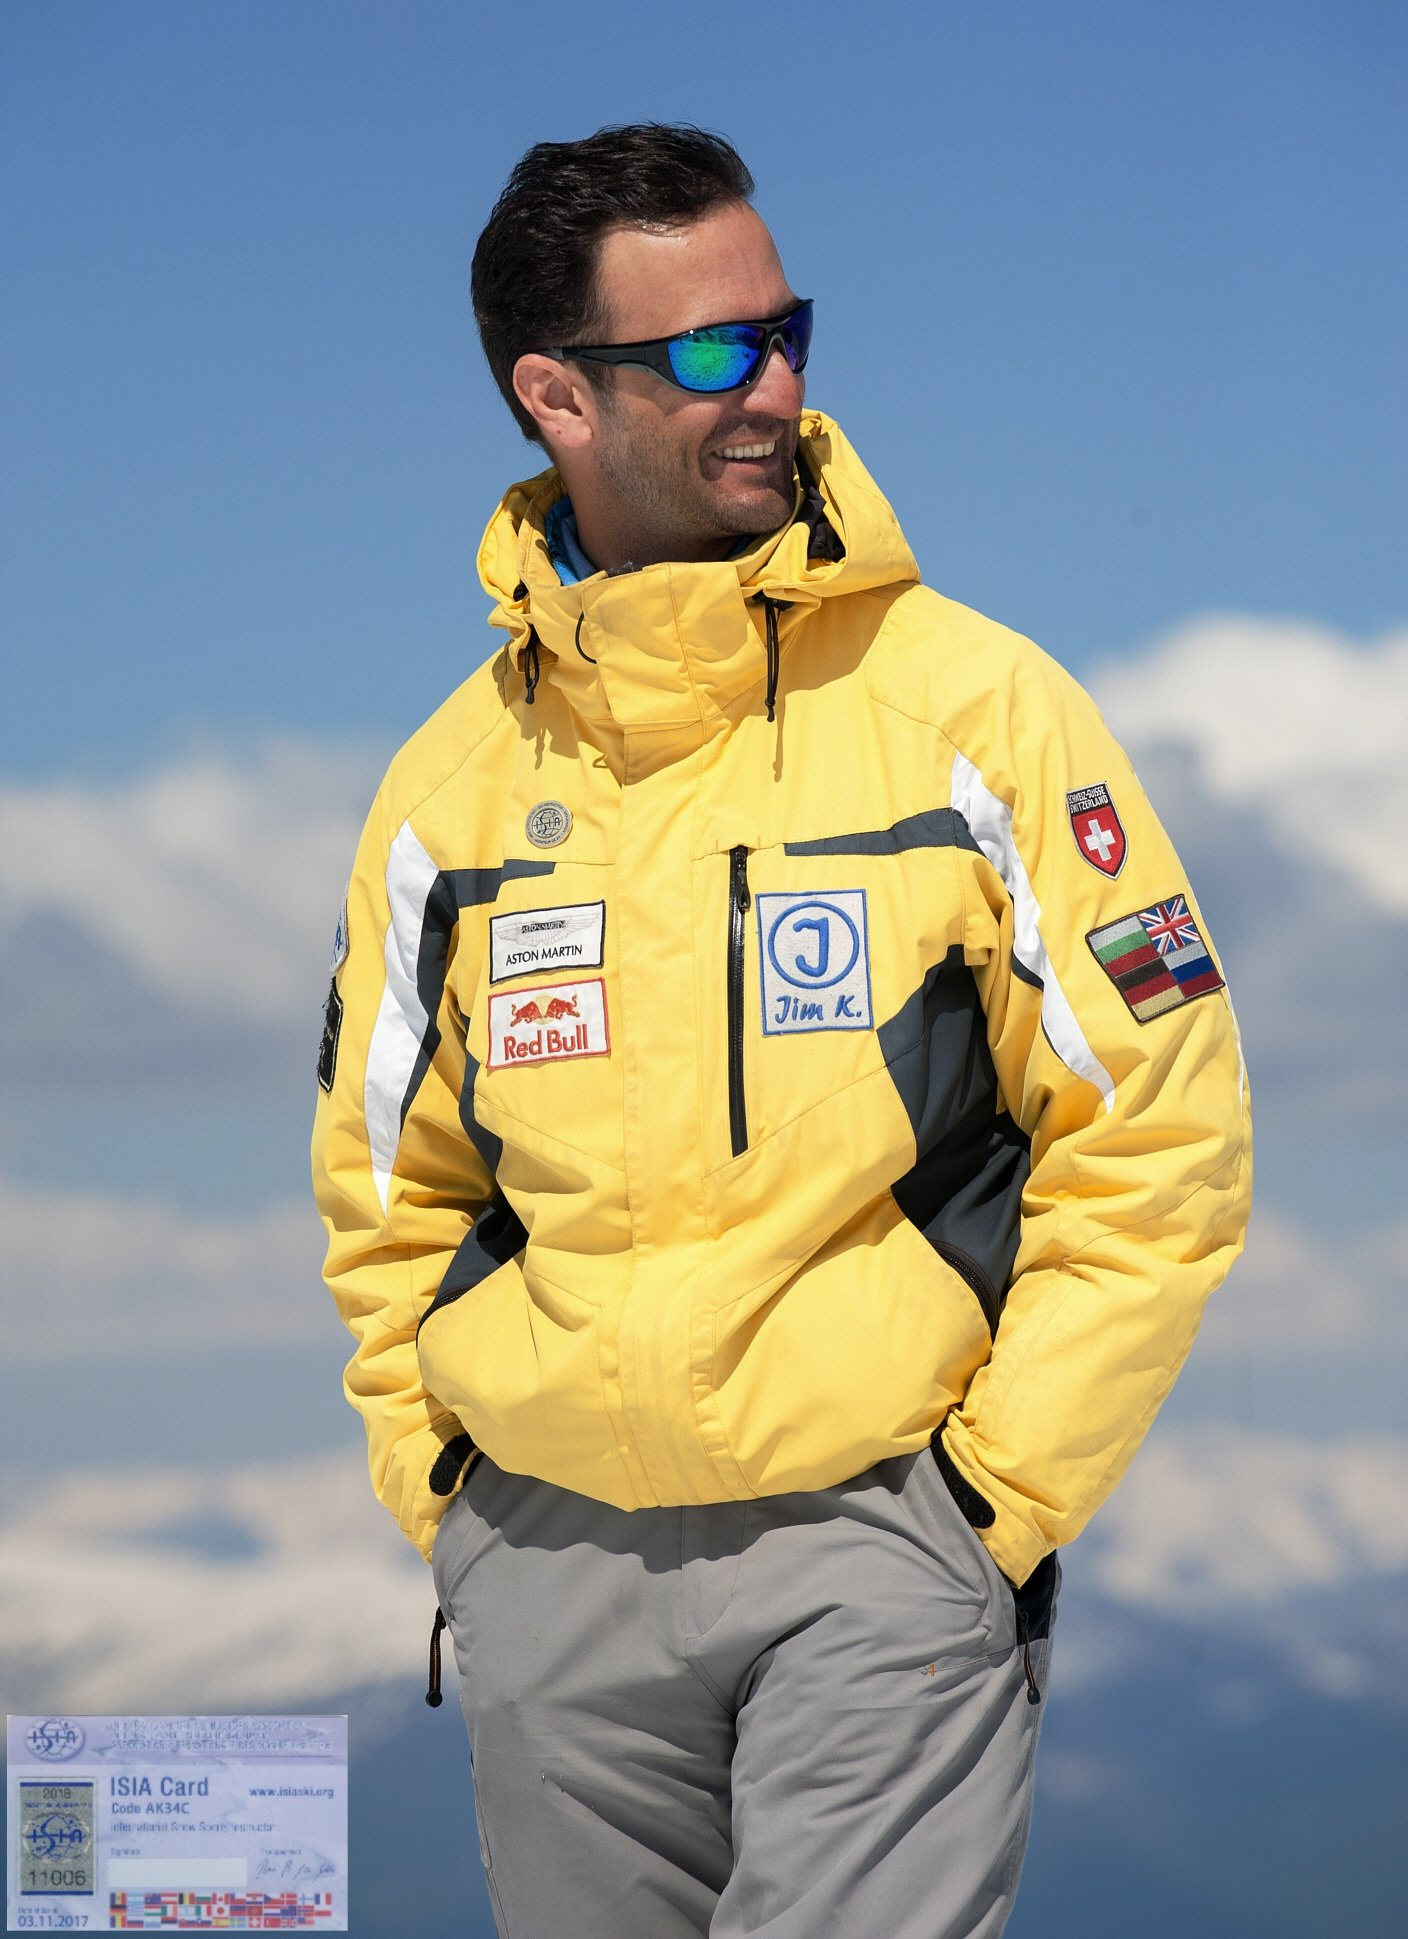 Freeride & Skilehrer